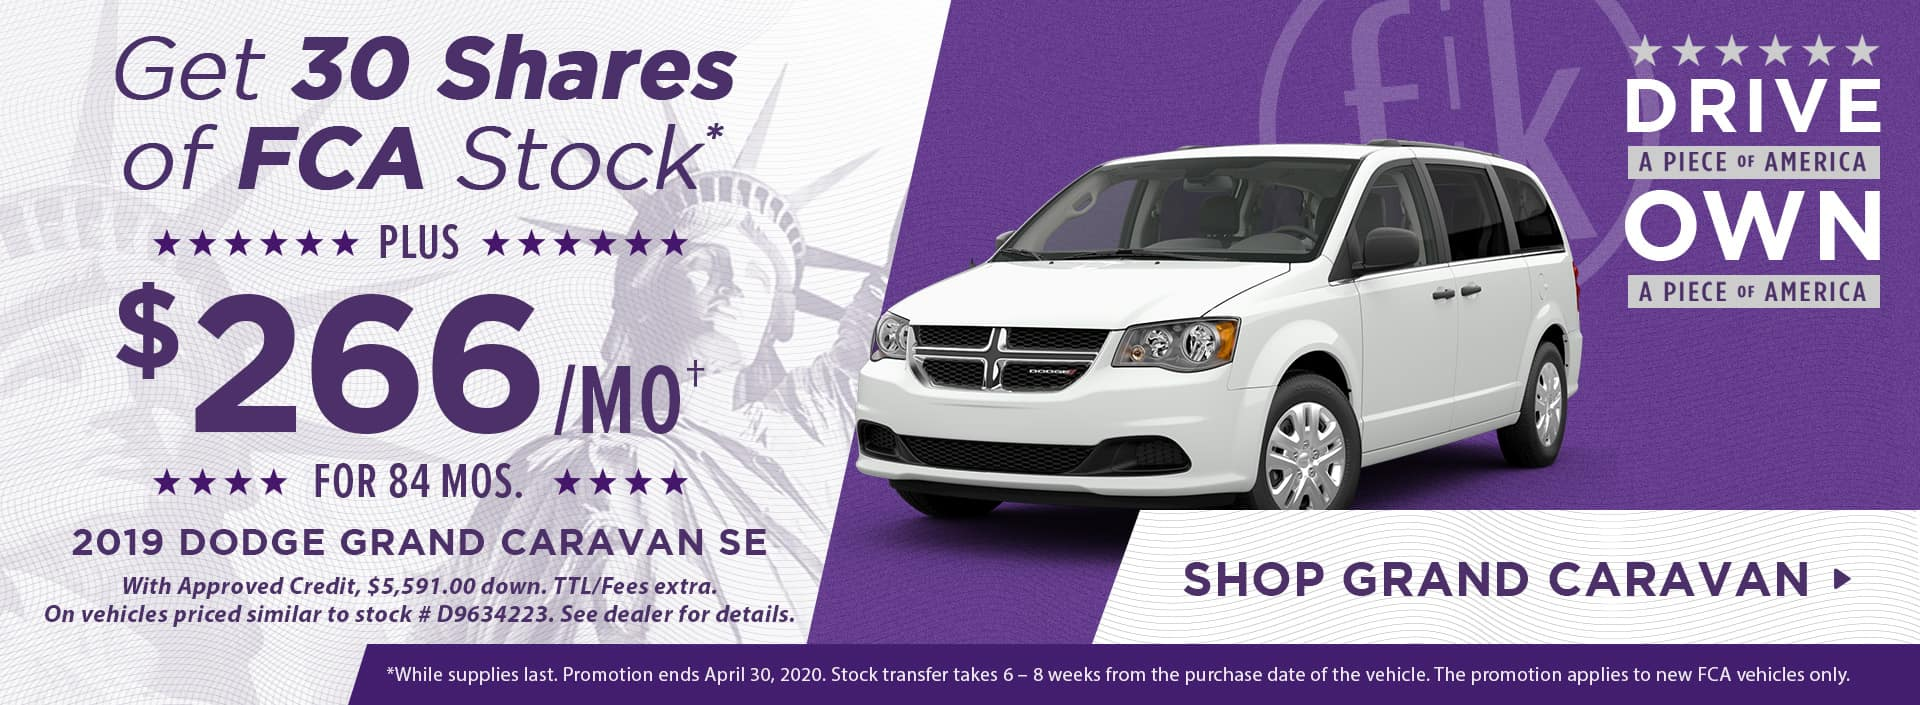 Get 30 Shares of FCA Stock PLUS $266/mo for 84 mos. 2019 Dodge Grand Caravan SE